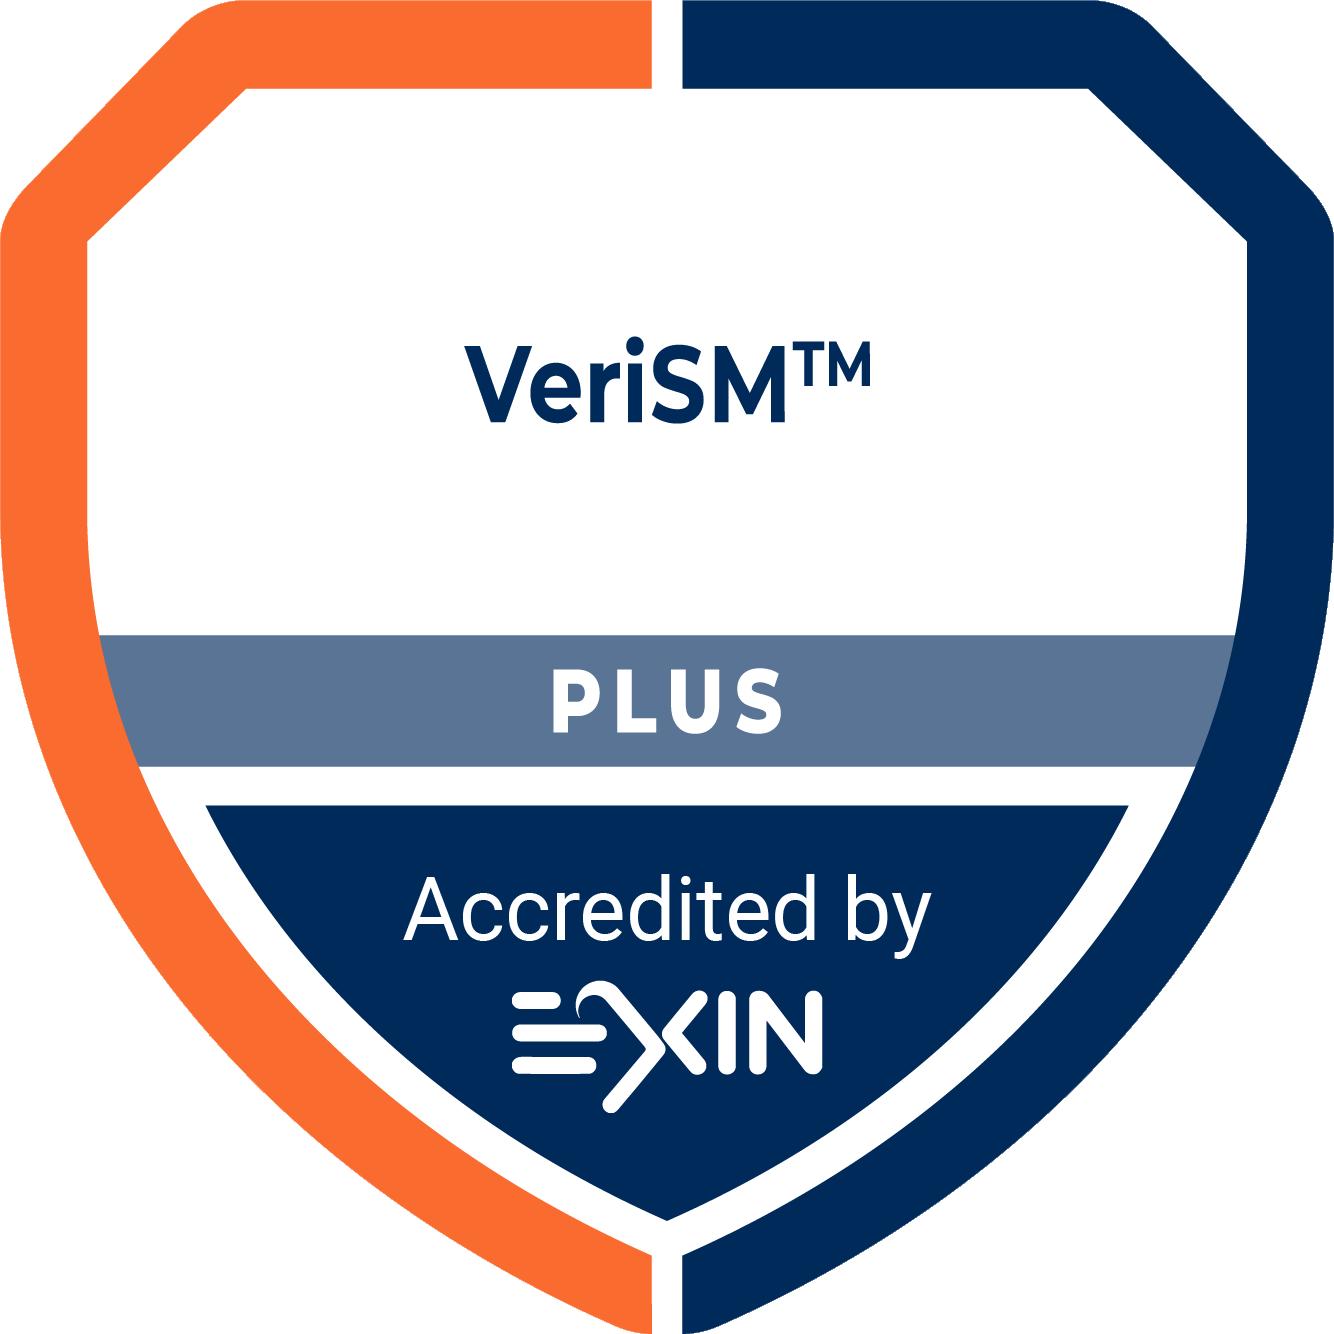 Accreditation Logo VeriSM Plus